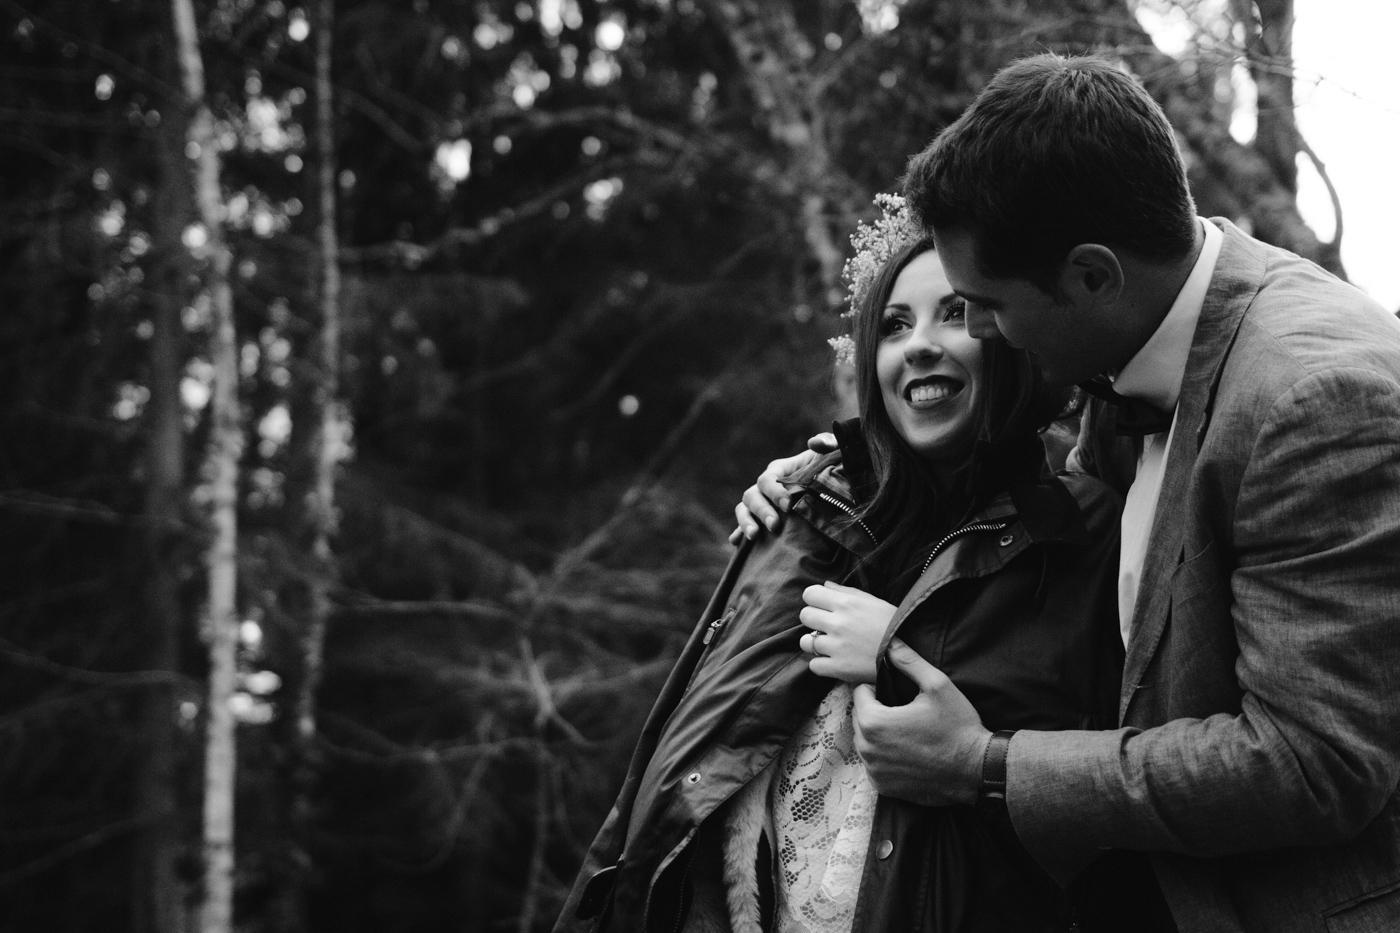 Velvet-Hush-fotografos-boda-al-aire-libre-madrid-110